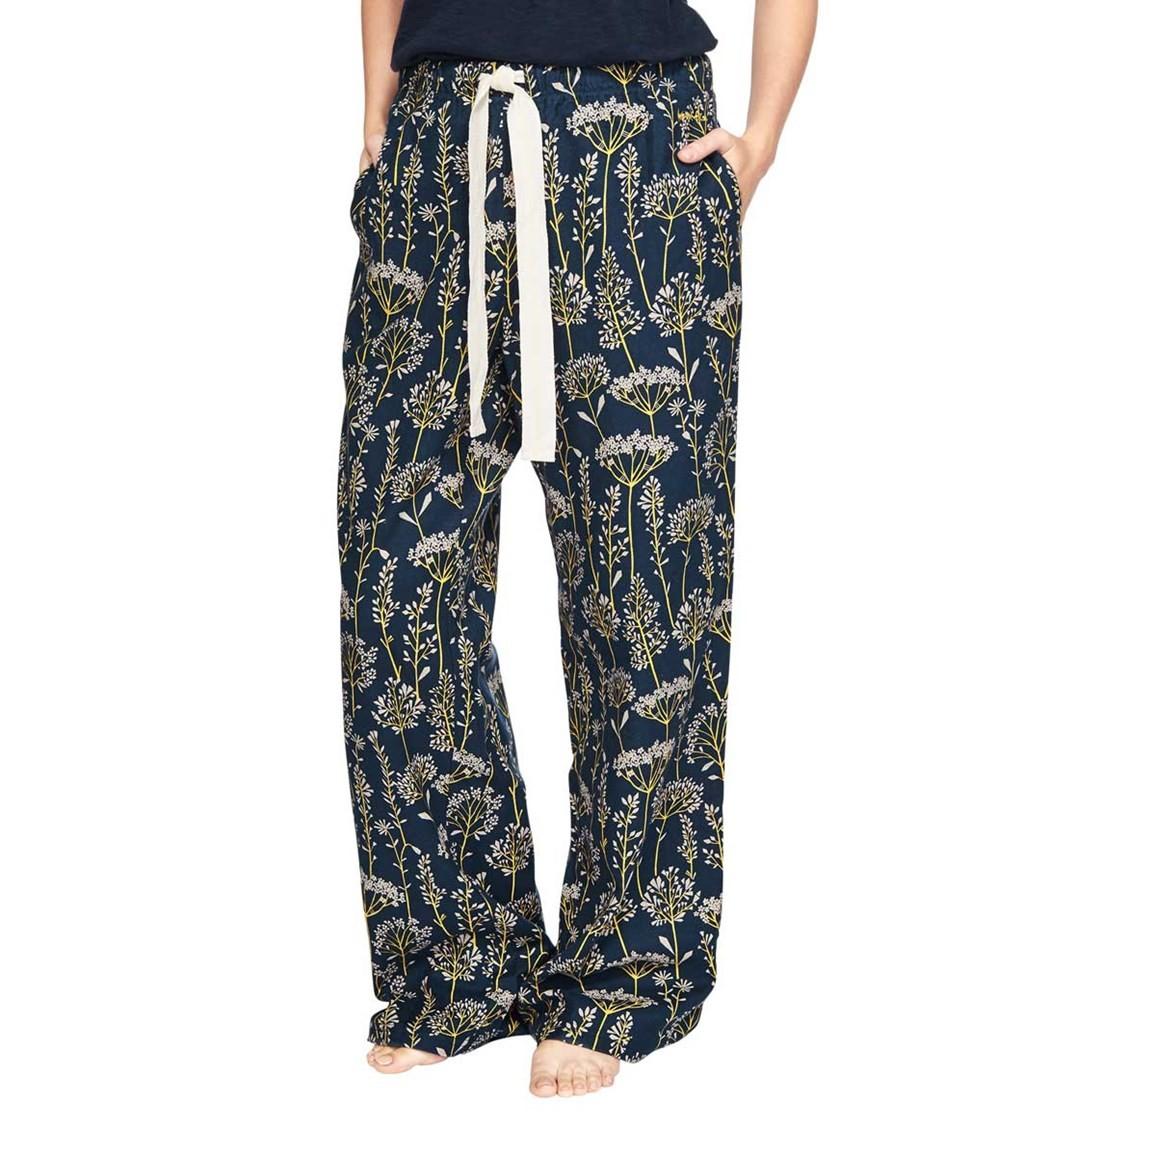 Iceland Cotton Printed Pyjama Bottoms Dark Navy